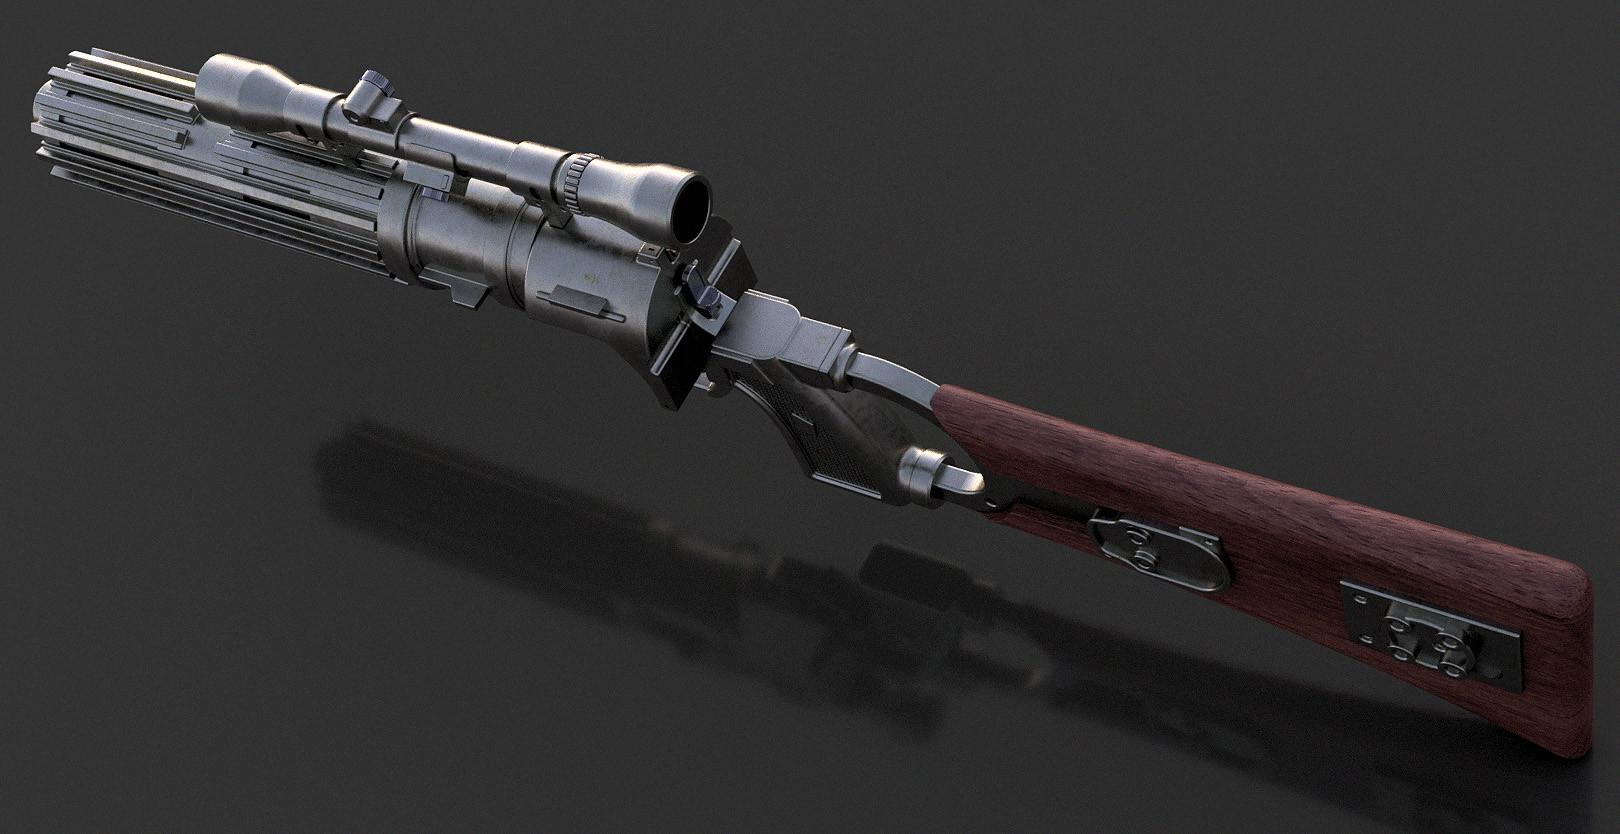 Sergey Kolesnik EE 3 Blaster Rifle